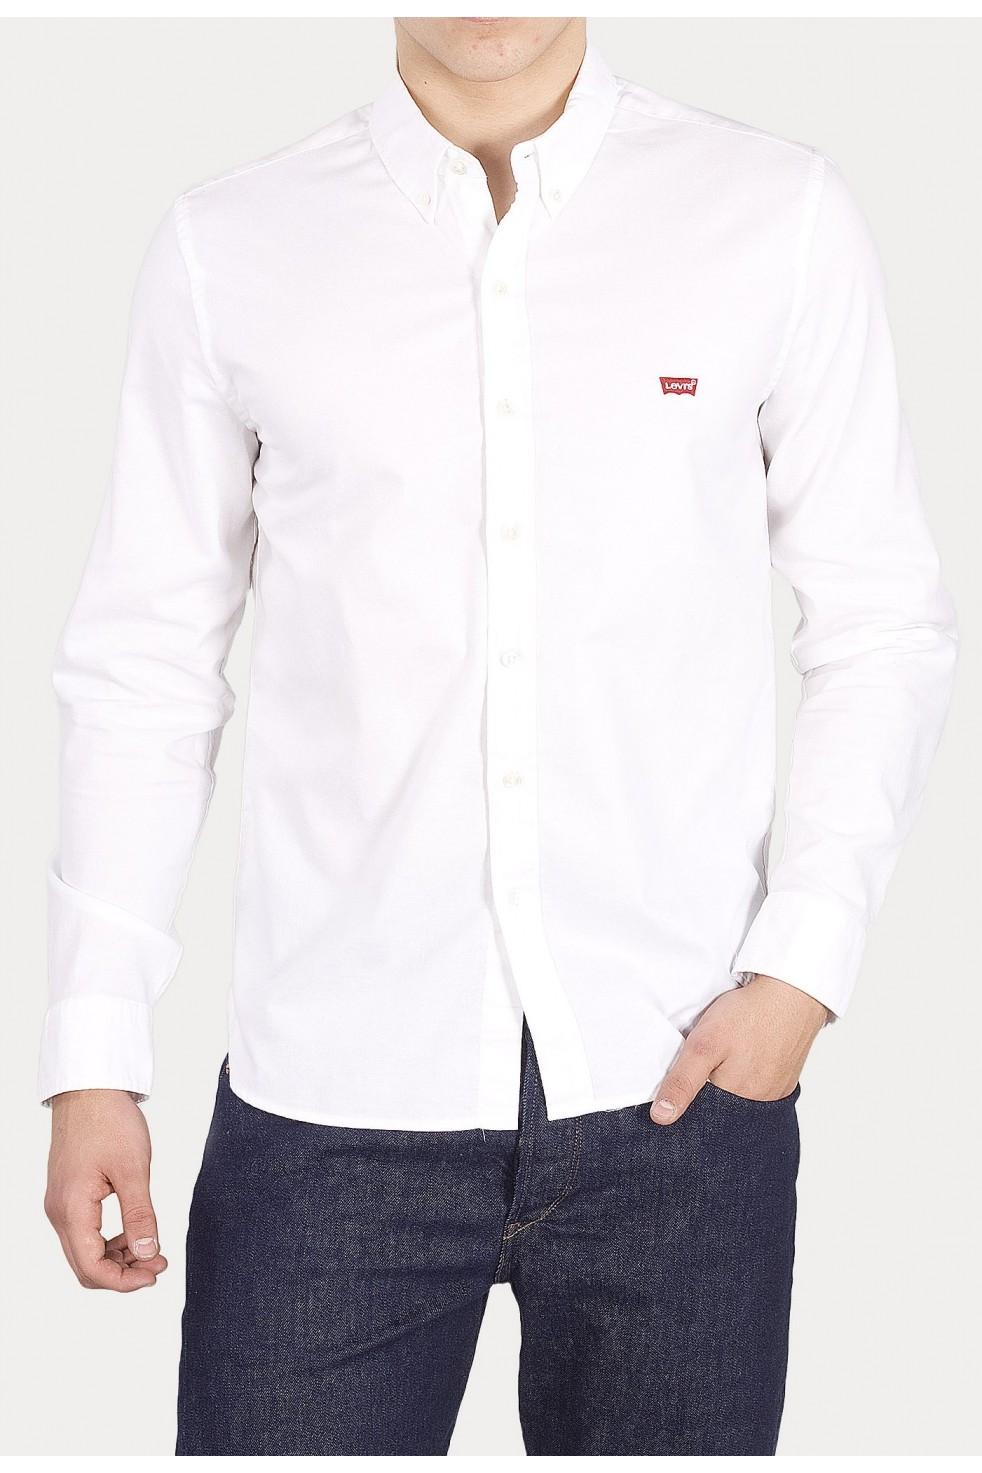 Levis-Erkek-Gömlek-Ls-Housemark-Shirt-74389-0000